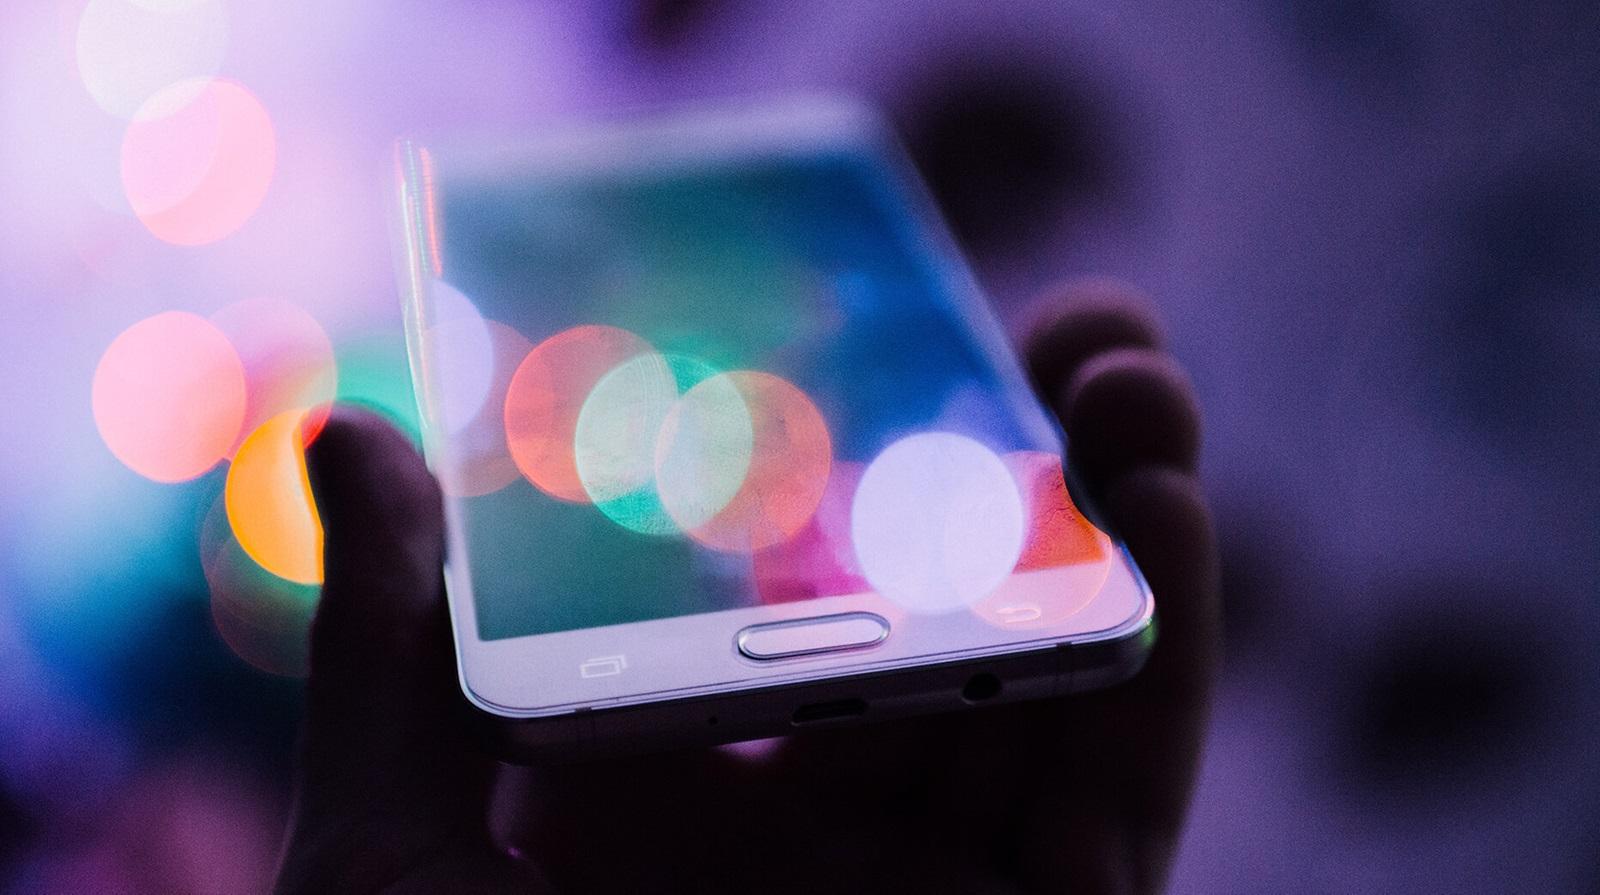 consuming digital media on a smartphone